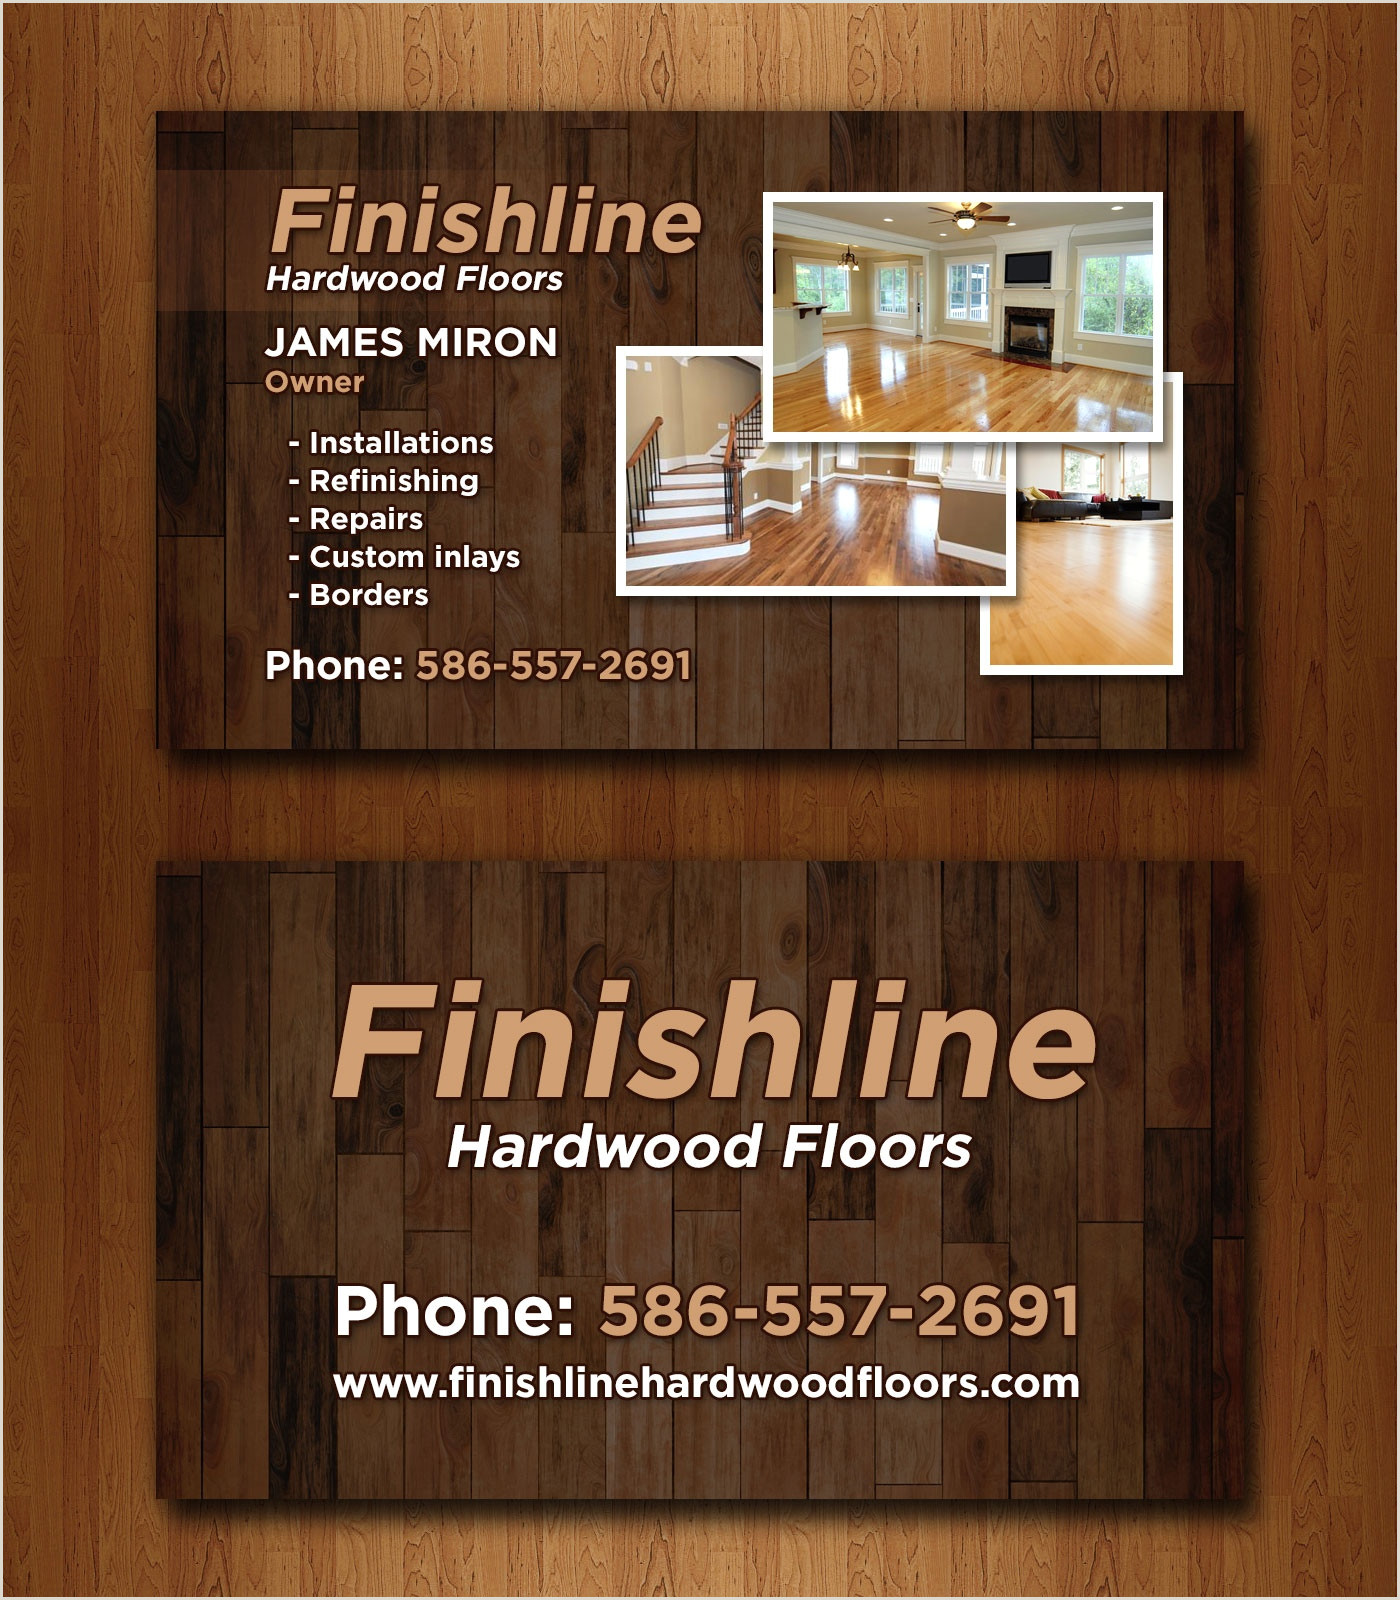 Visiting Card Design 14 Popular Hardwood Flooring Business Card Template